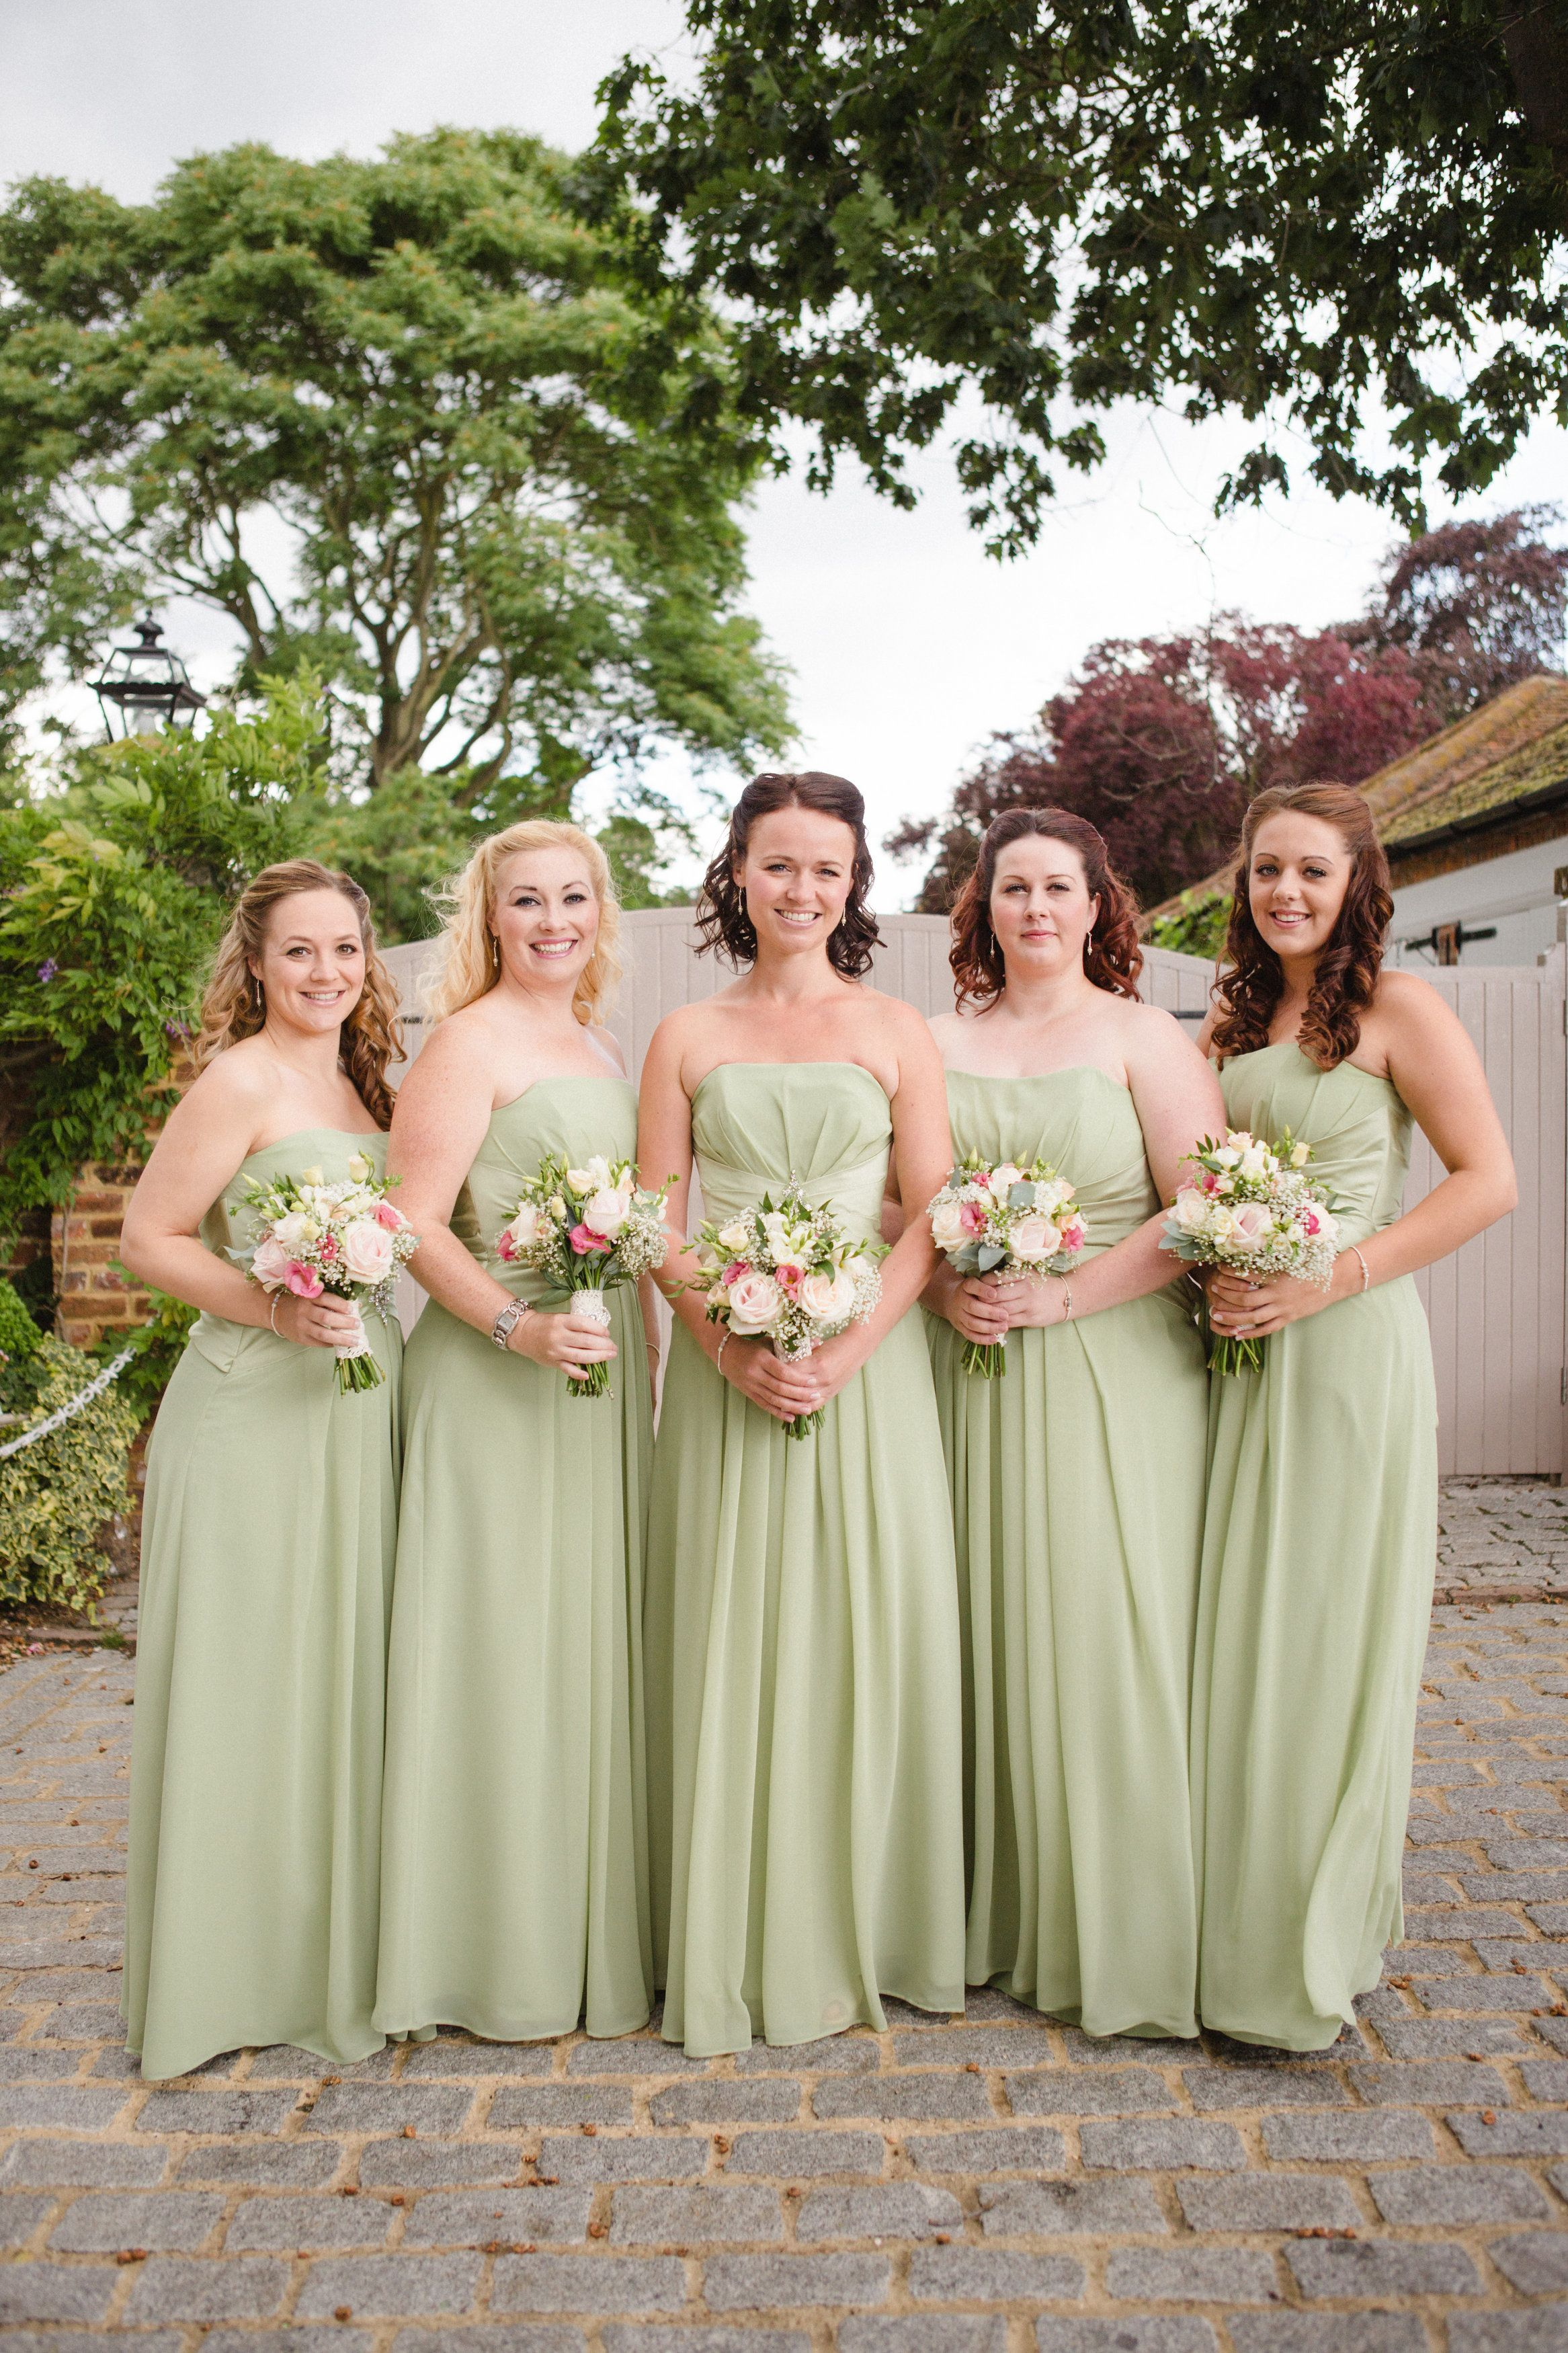 Green bridesmaids ebony rose monica bridesmaids pinterest green bridesmaids ebony rose monica mint green bridesmaid dresseslola ombrellifo Image collections